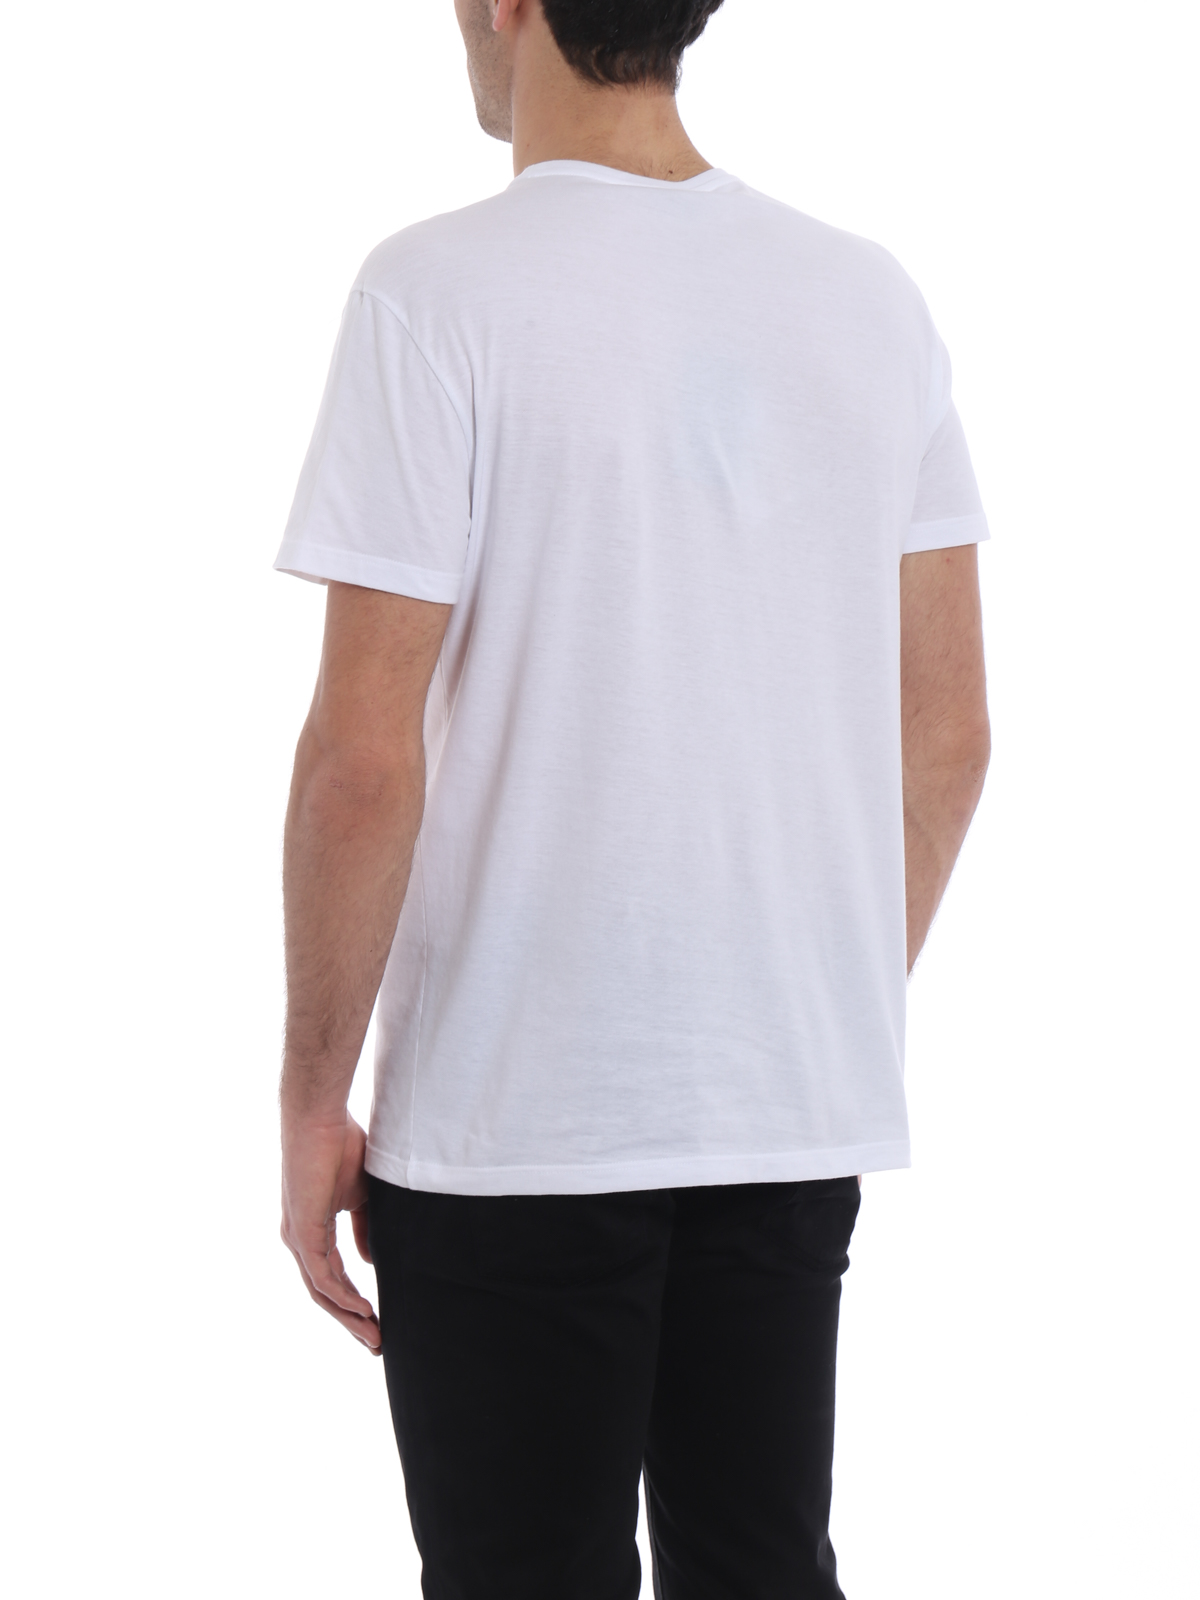 6c1018084 Alexander Mcqueen - Skull patchwork print white T-shirt - t-shirts ...